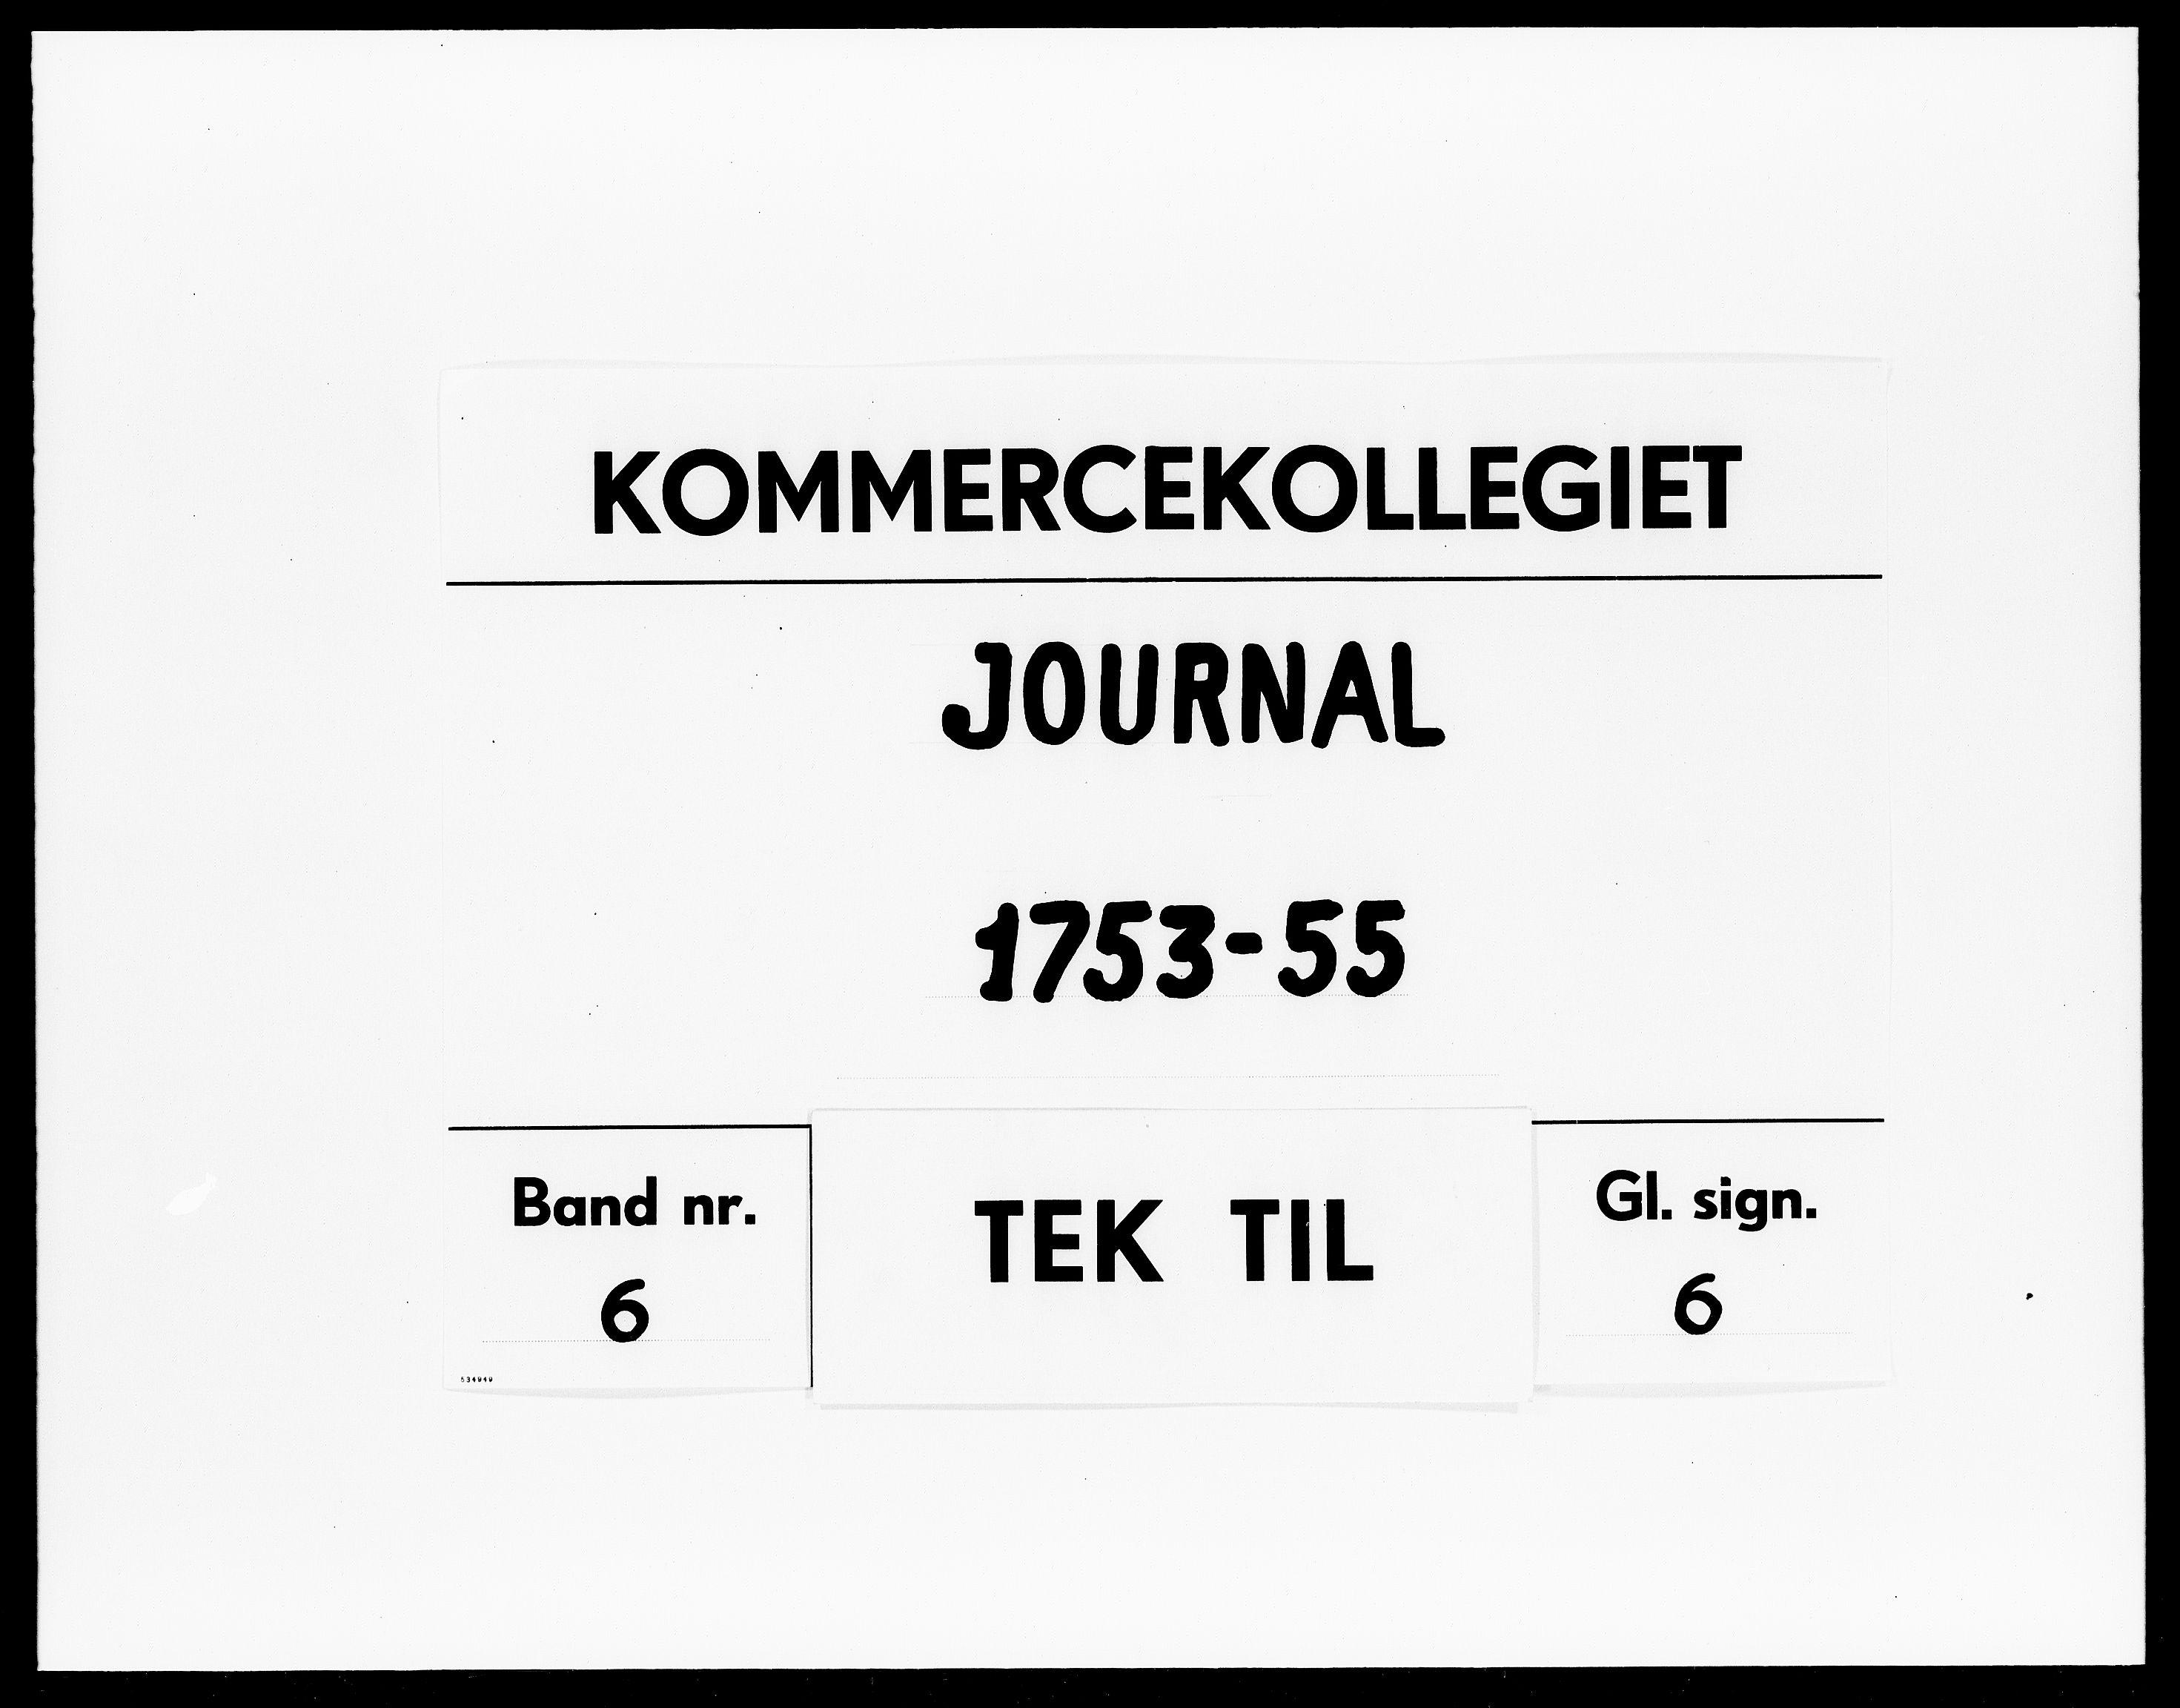 DRA, Kommercekollegiet, Dansk-Norske Sekretariat, -/54: Journal nr. 6, 1753-1755